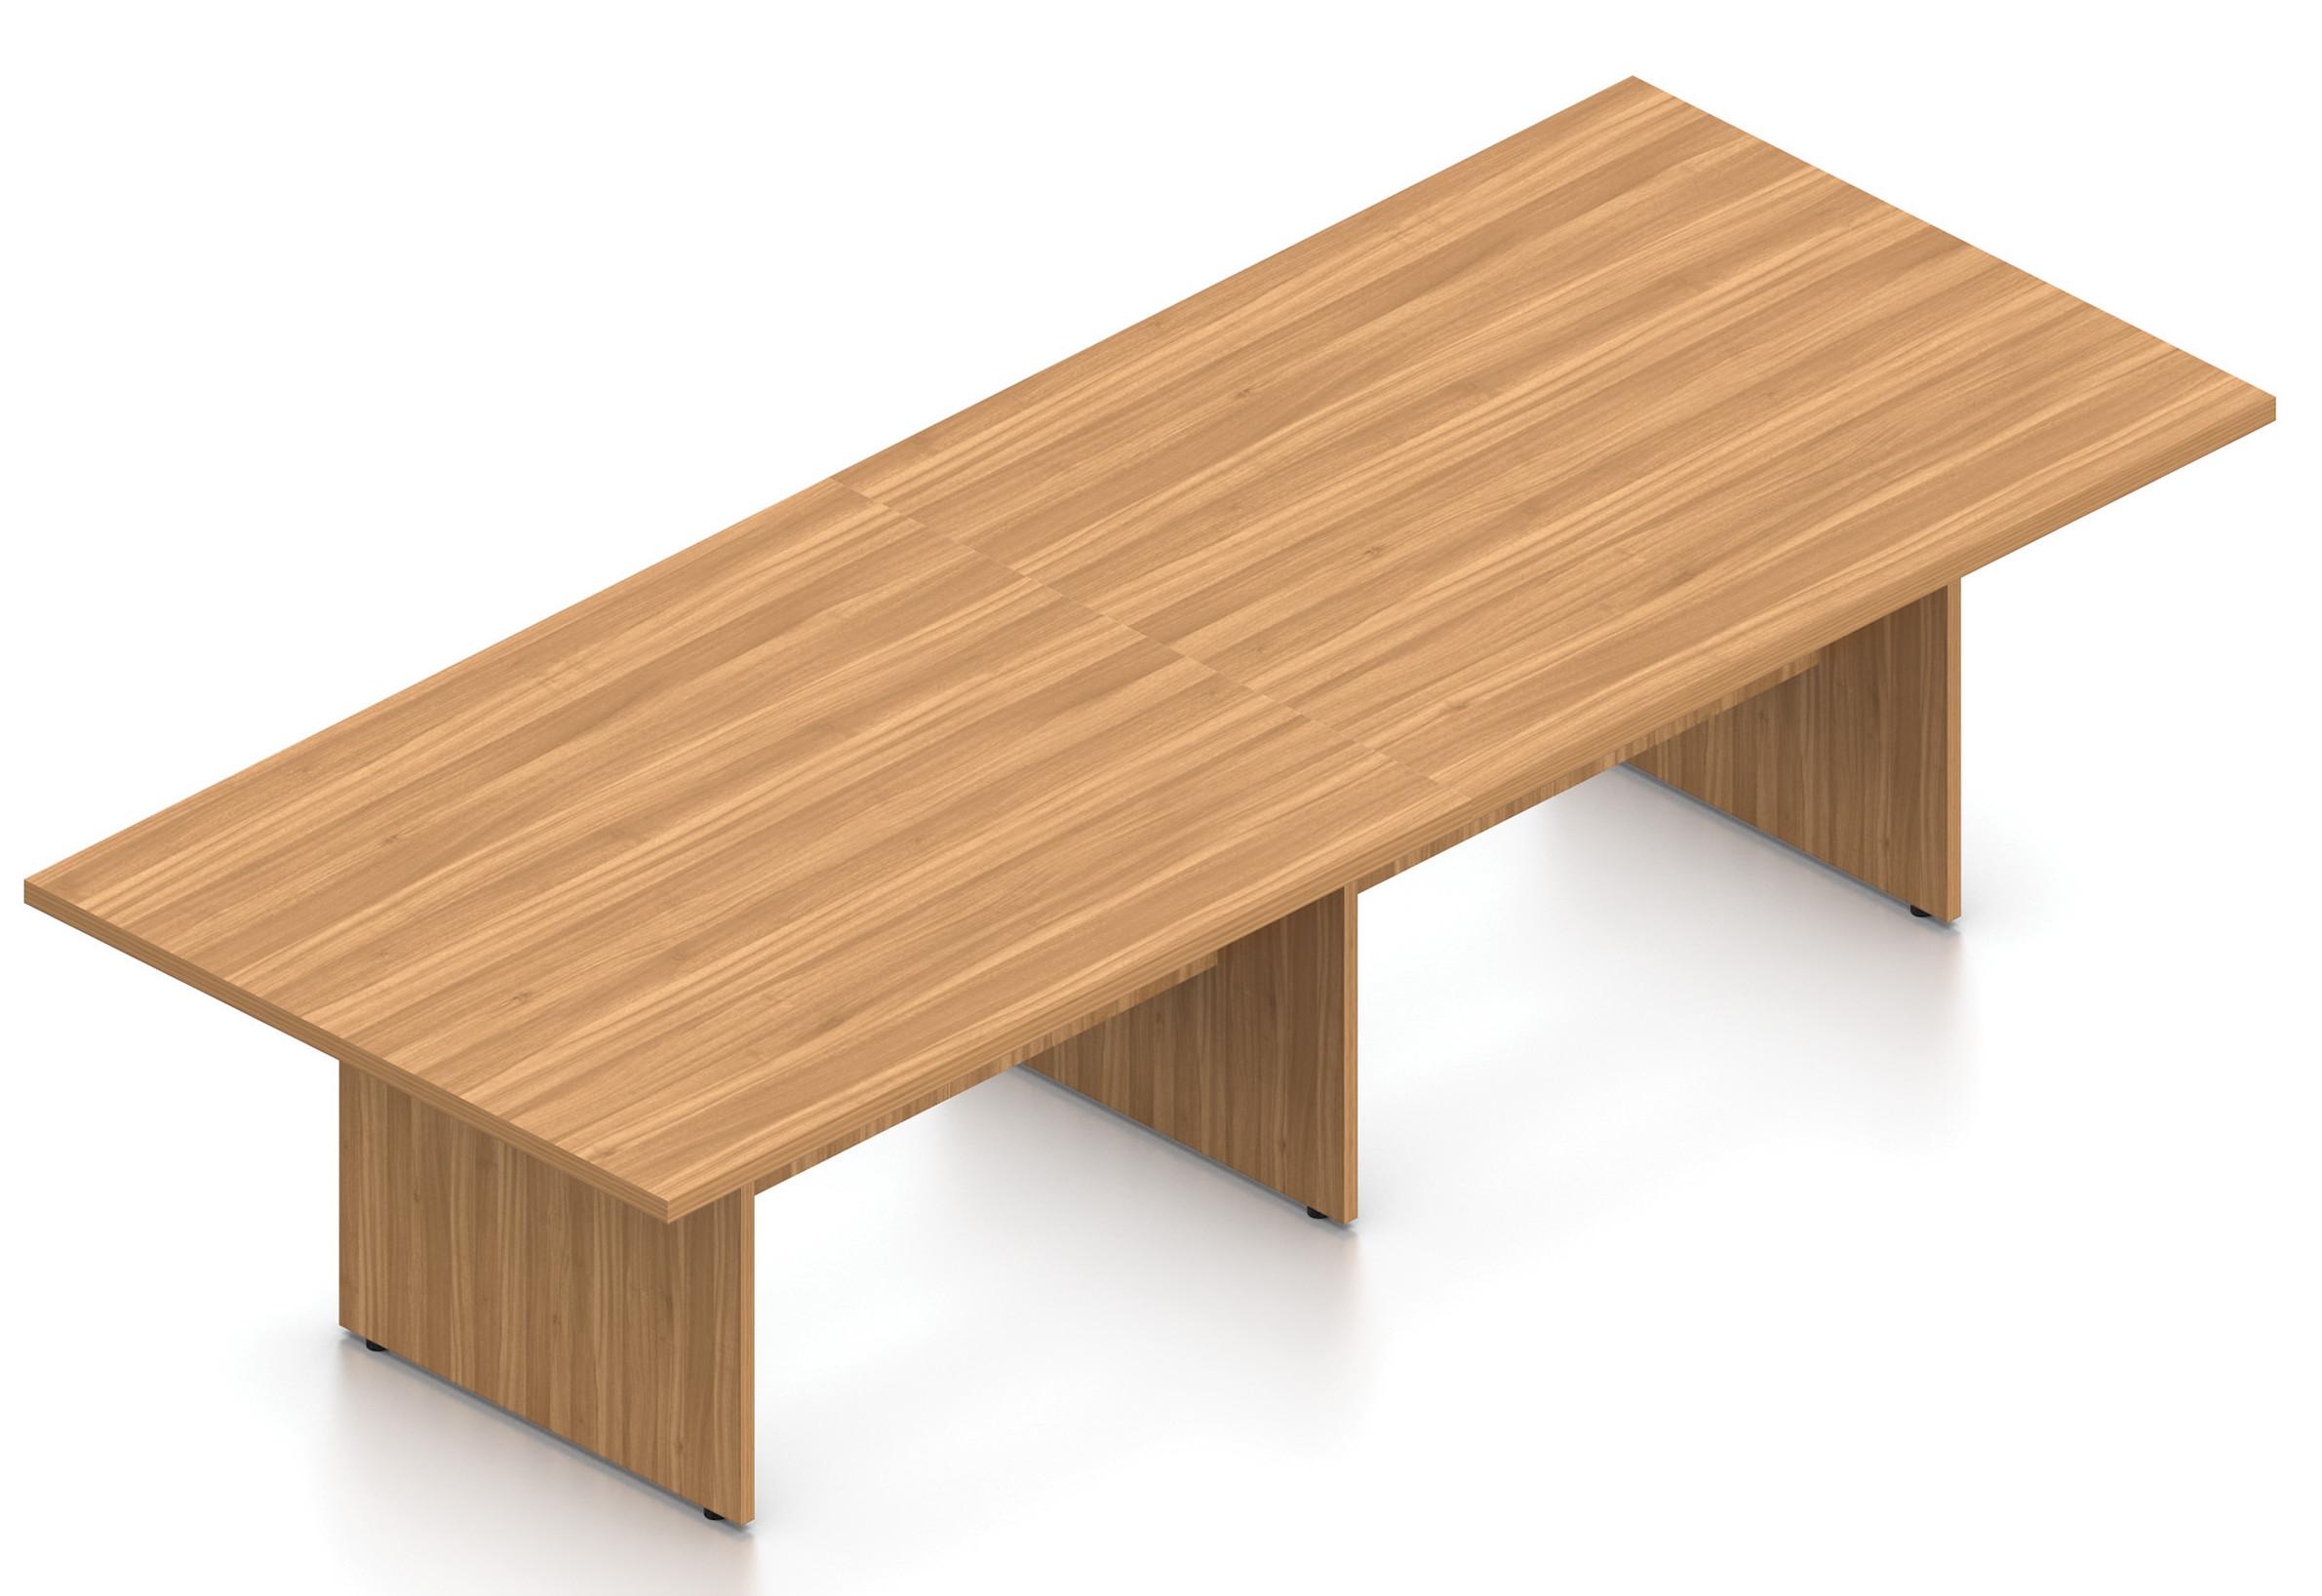 autumn walnut 10' superior laminate rectangular conference table